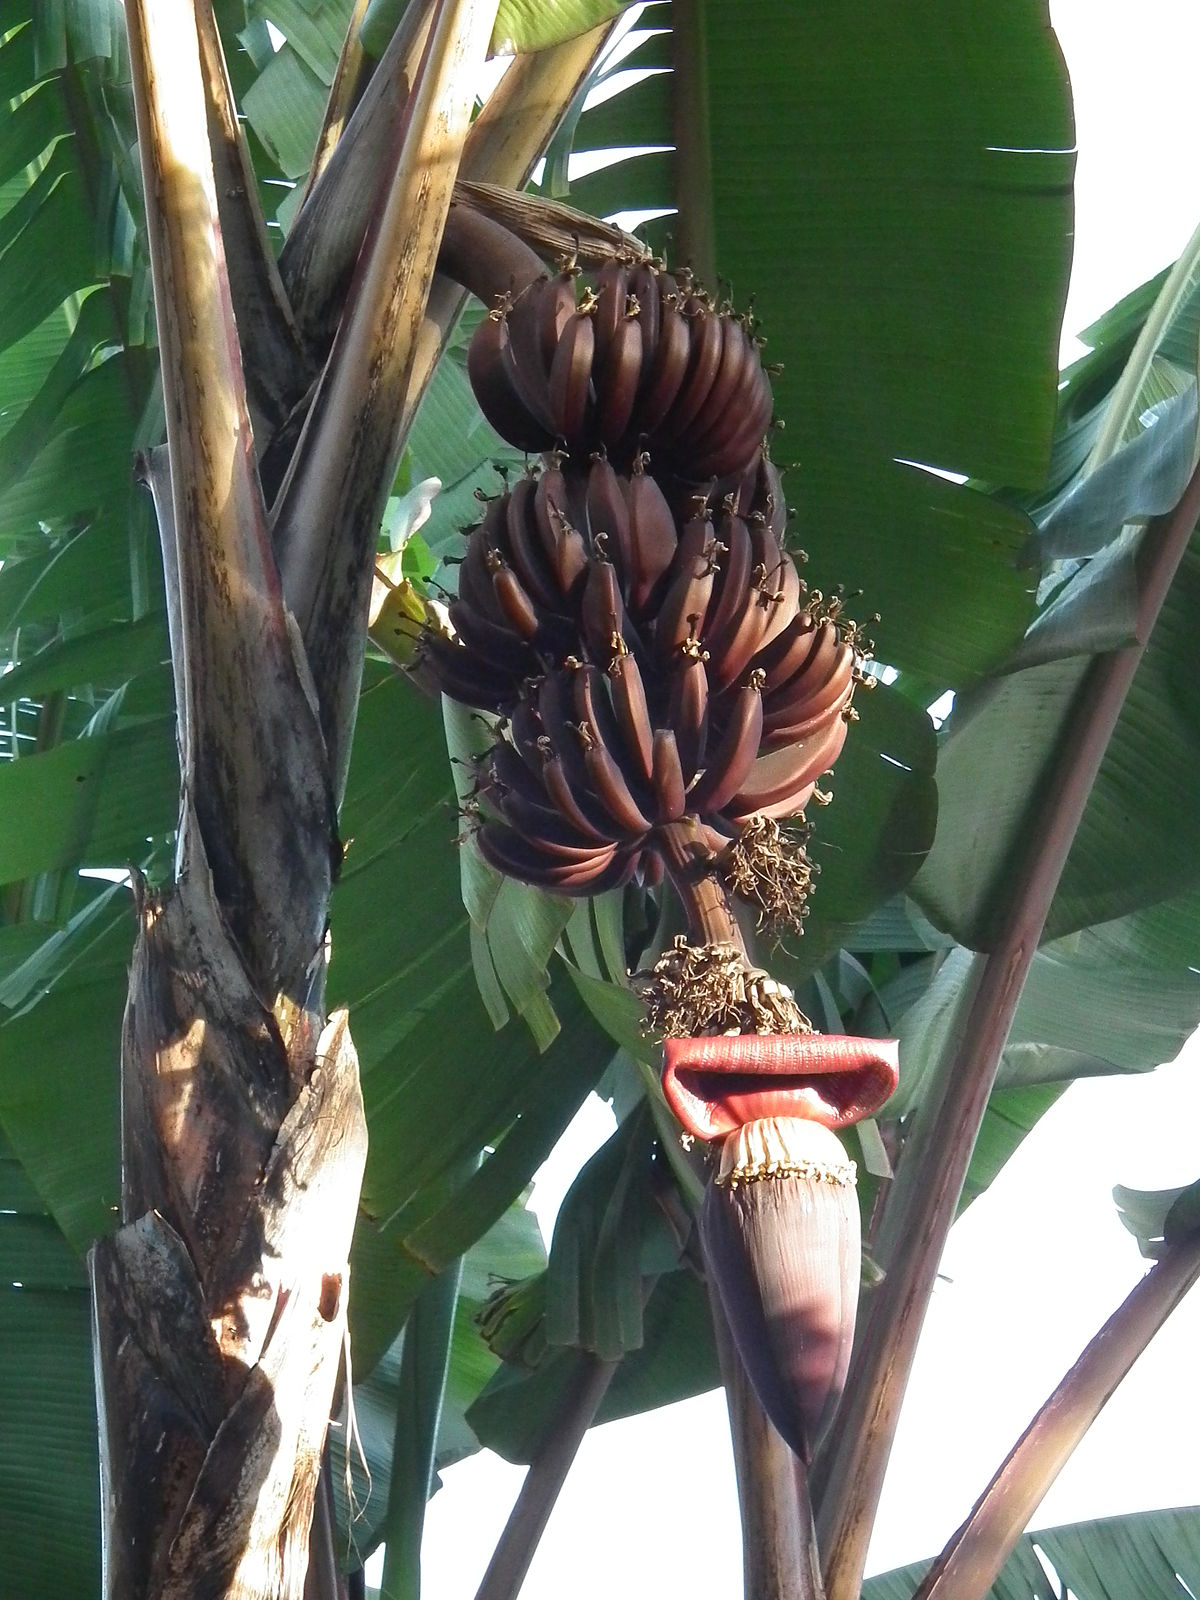 Red banana - Wikipedia